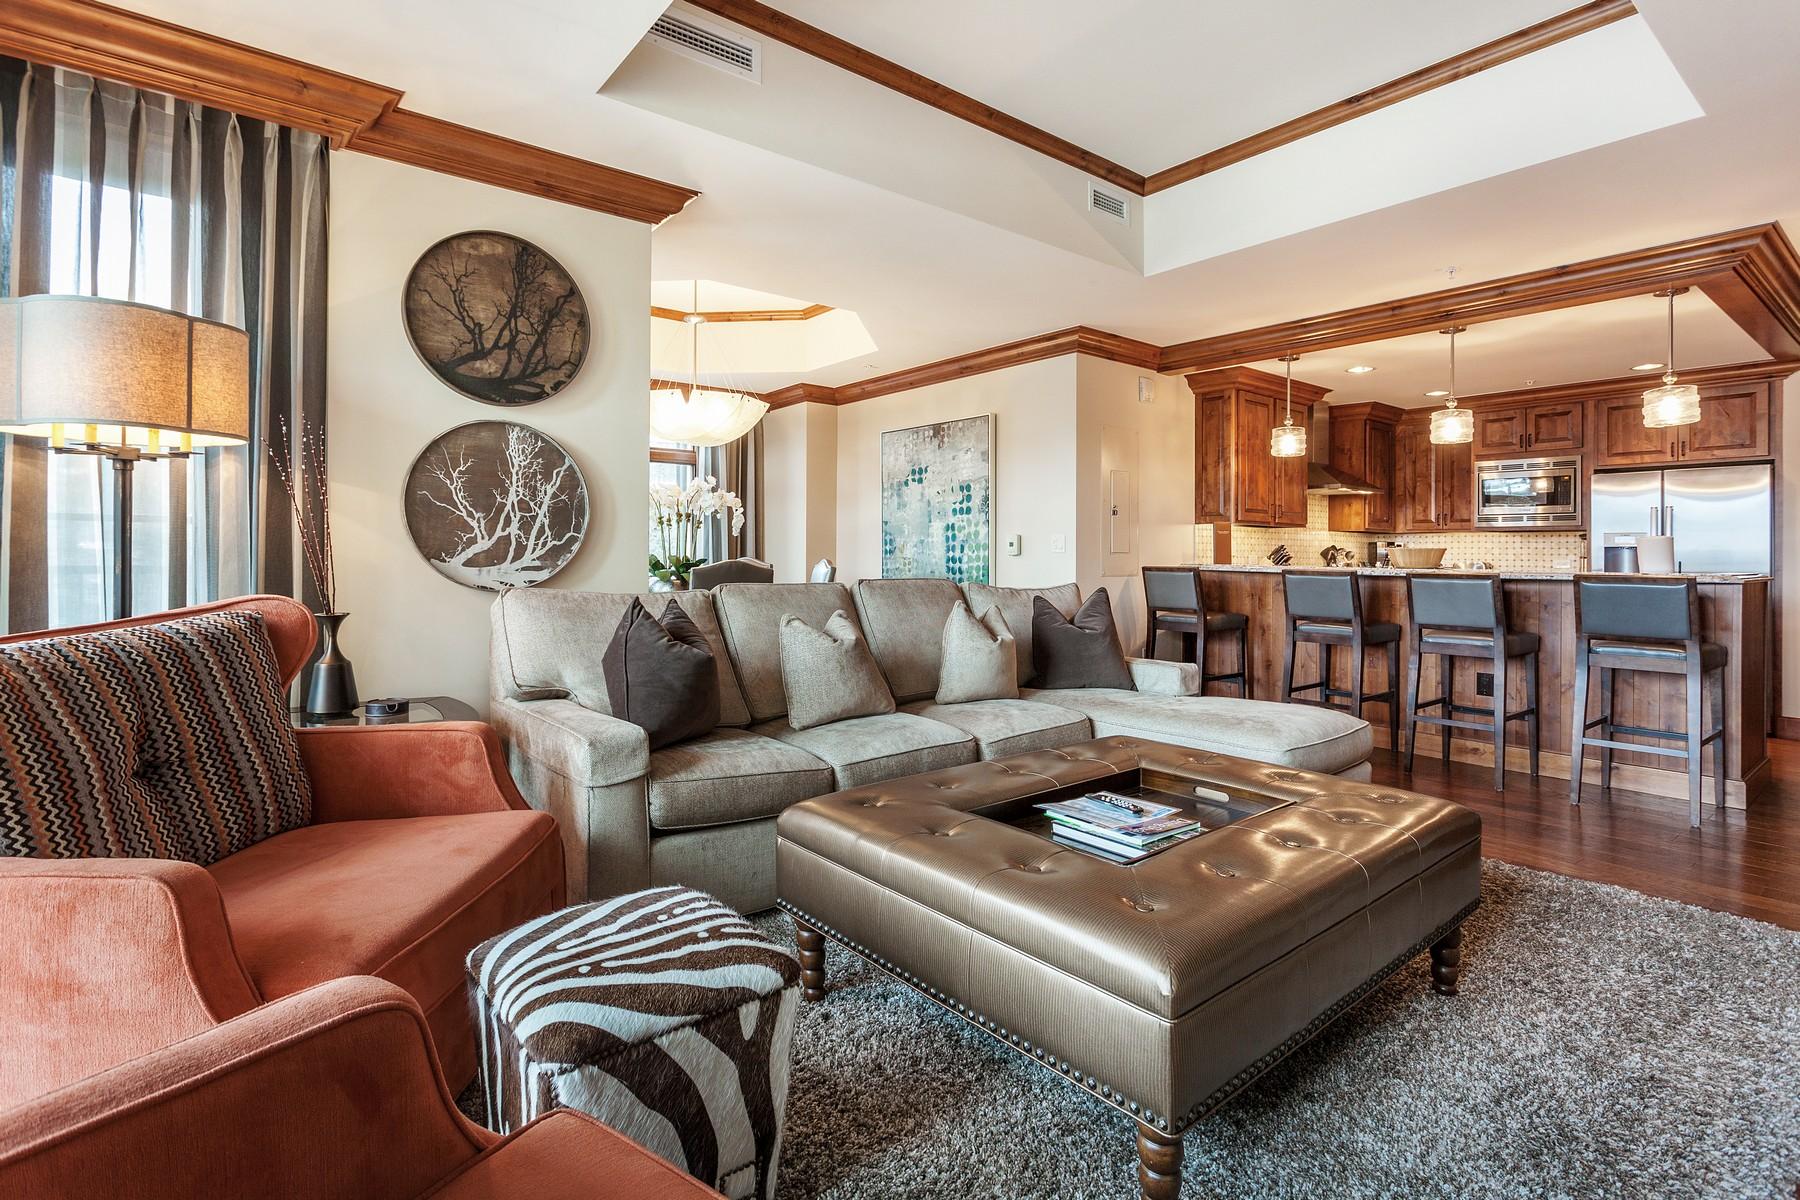 Apartment for Sale at The Ritz-Carlton Residences R-208 728 W Lionshead Cir #R-208 Lionshead, Vail, Colorado, 81657 United States